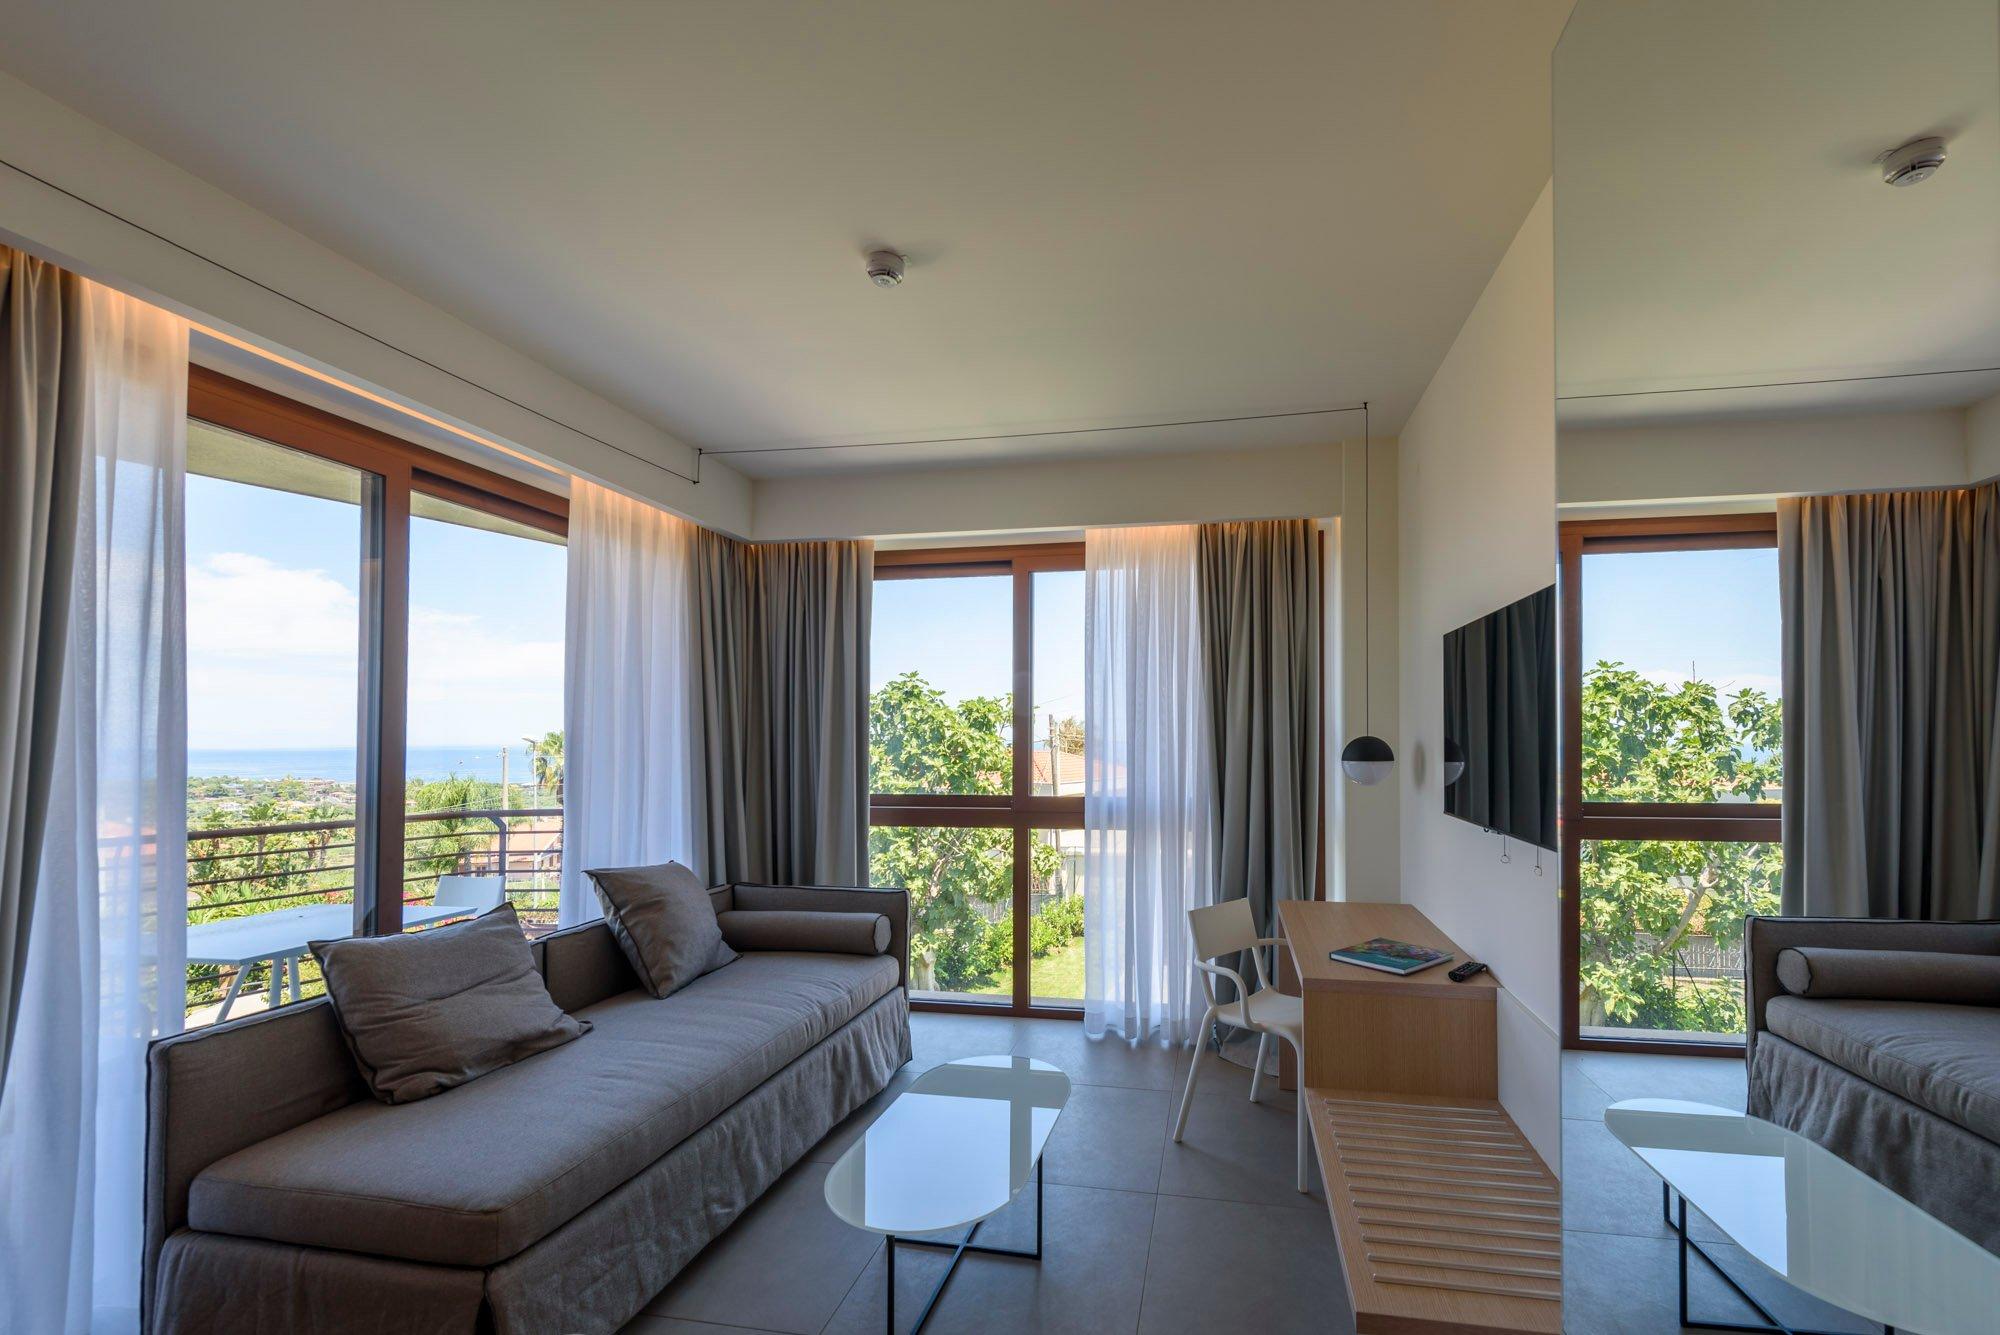 Hotel a Giarre – Scau Studio – photos by Moreno Maggi